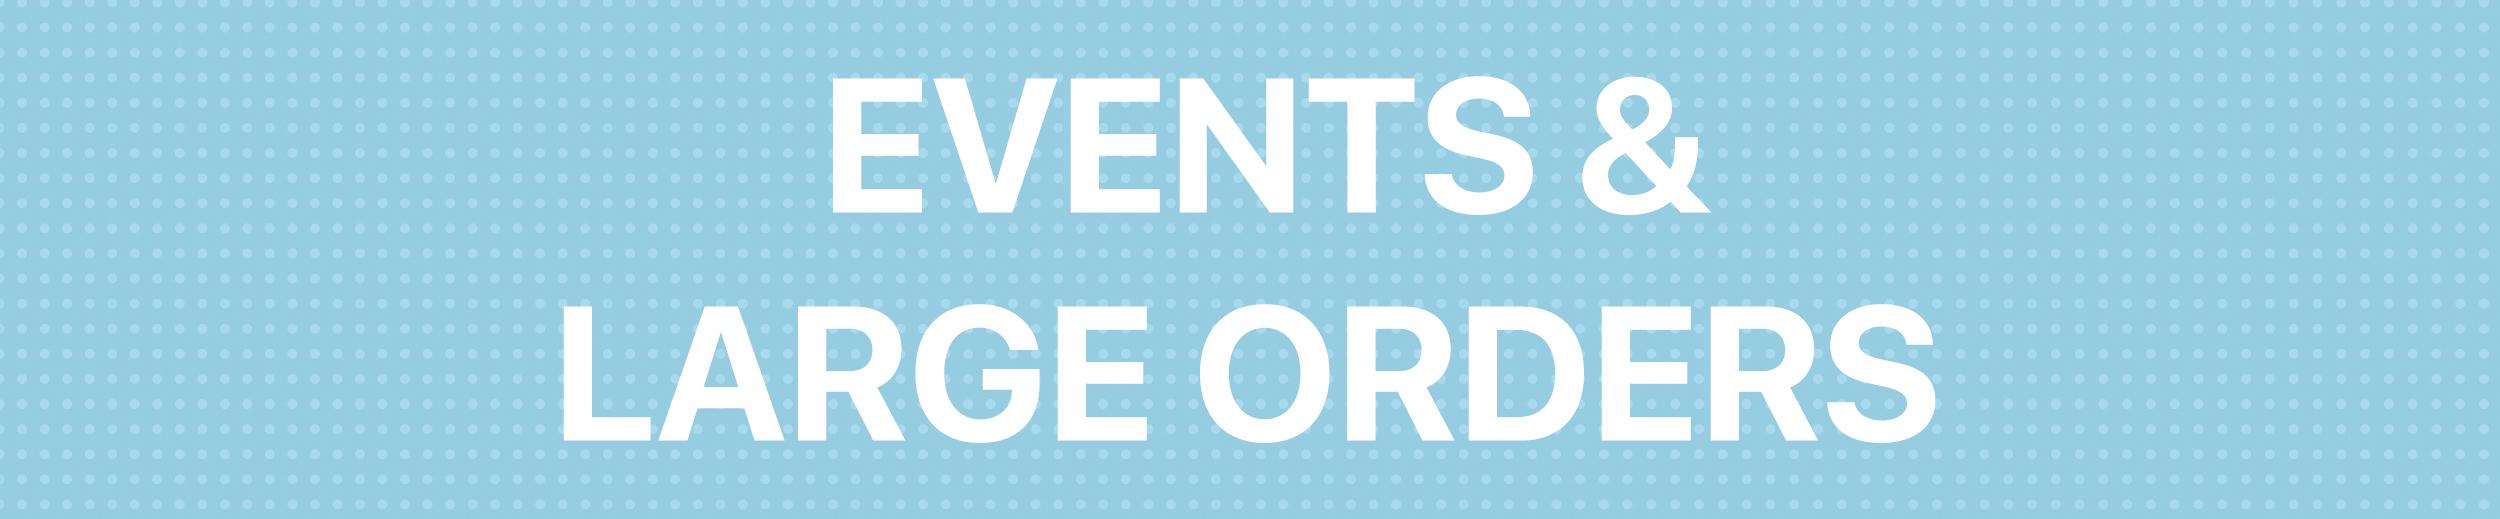 Events_banner.jpg